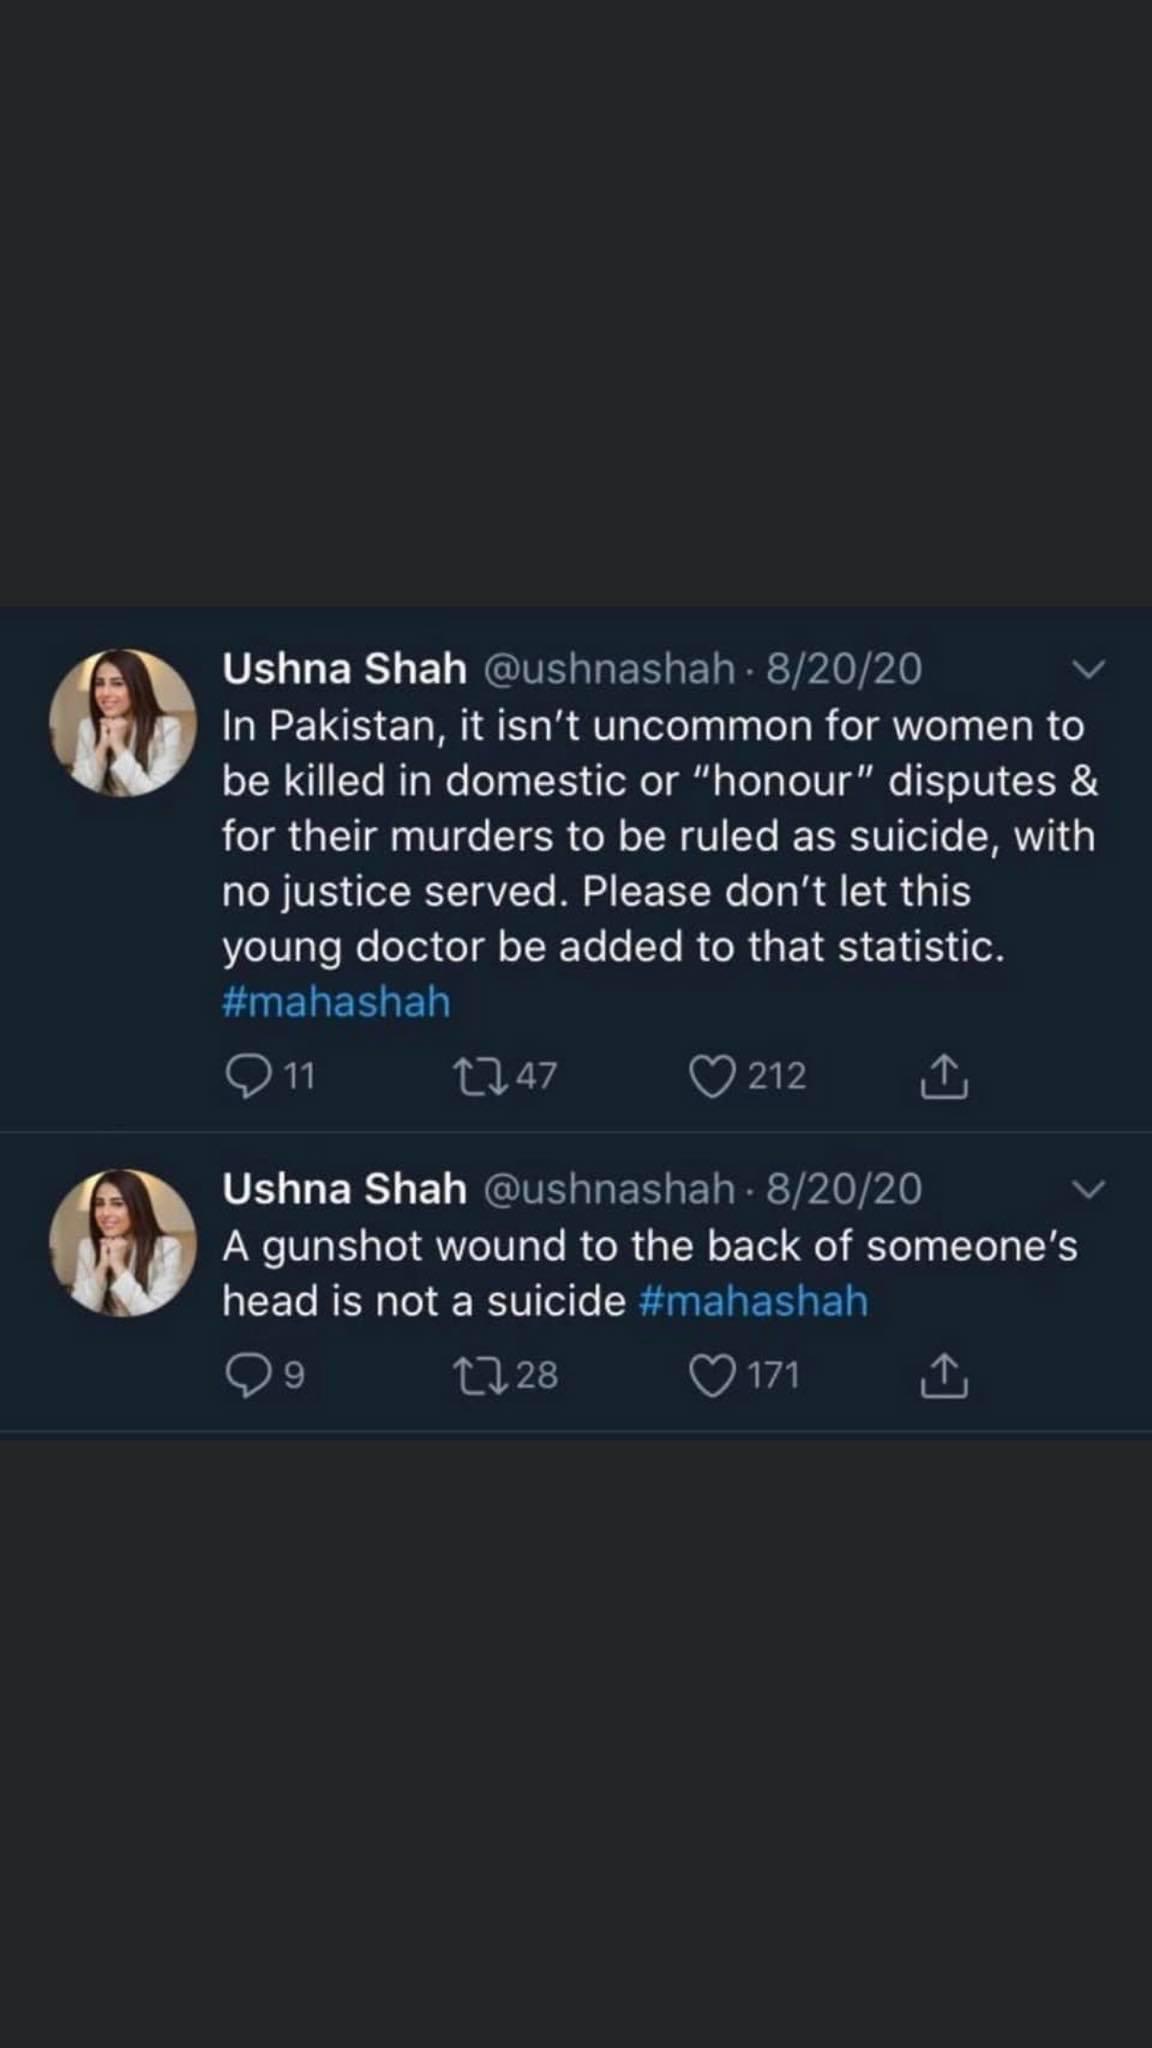 Ushna Shah involvement in Dr. Maha Shah's case